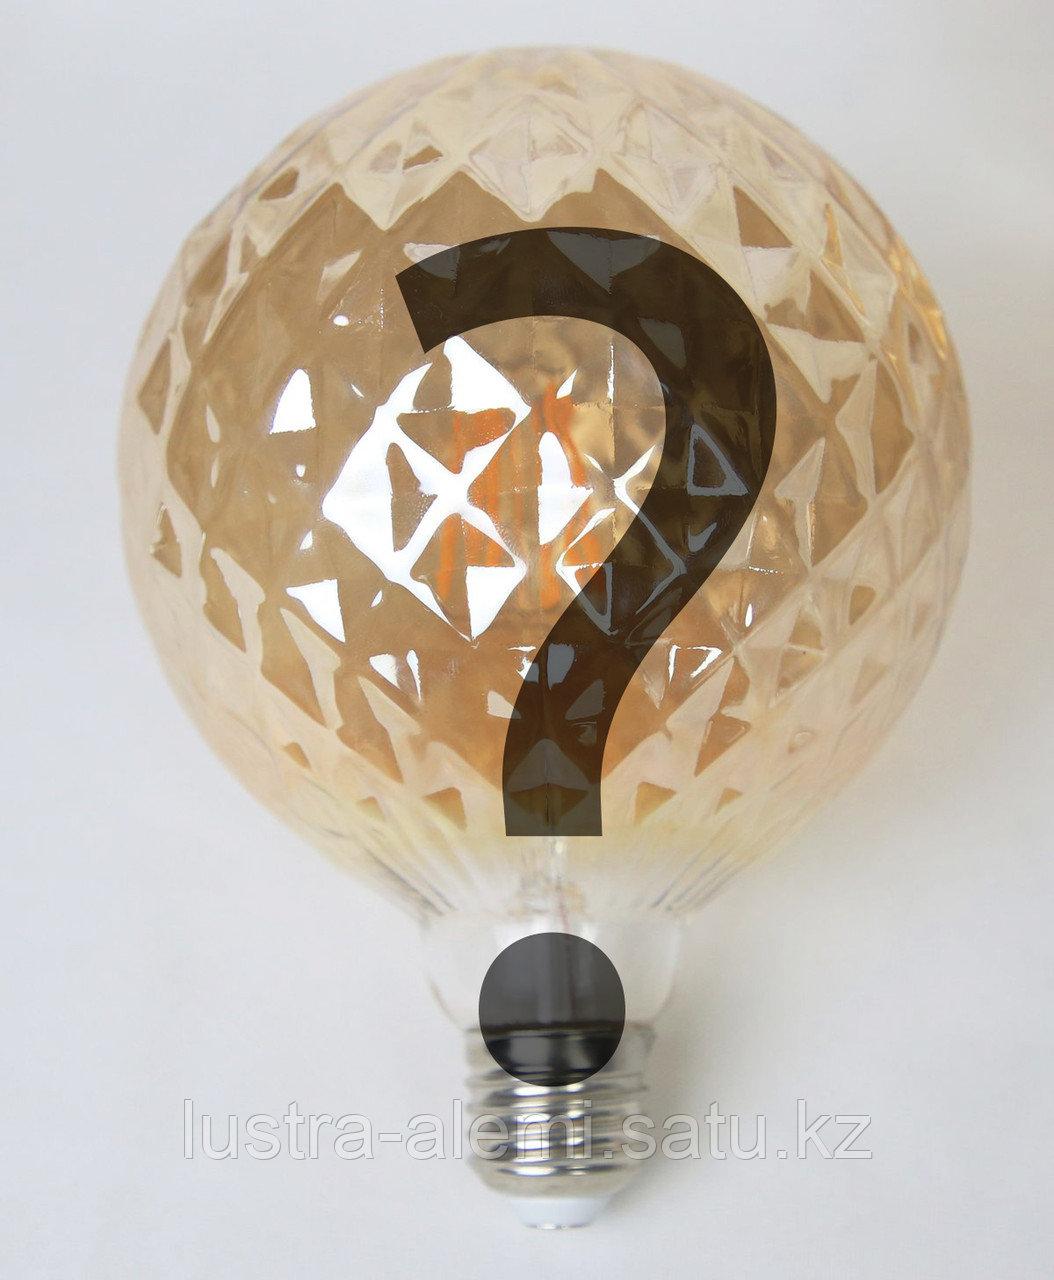 Лампа Эдисона проз  4вт  E27